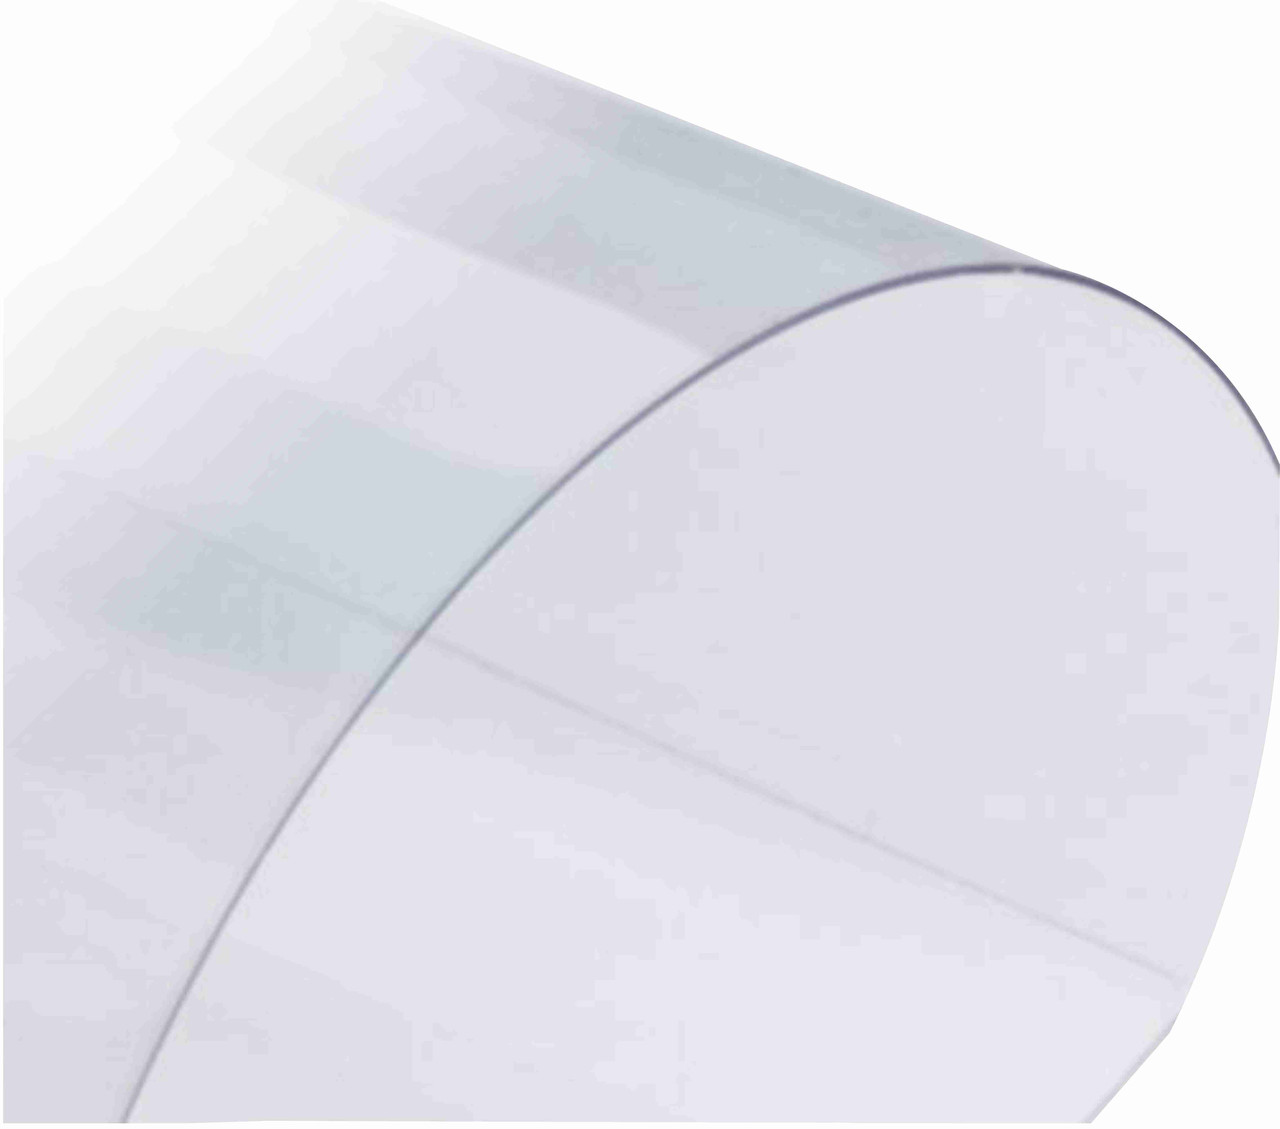 Прозрачный, жесткий листовой PVC пластик (0,35 мм) 1,22м х2,44м